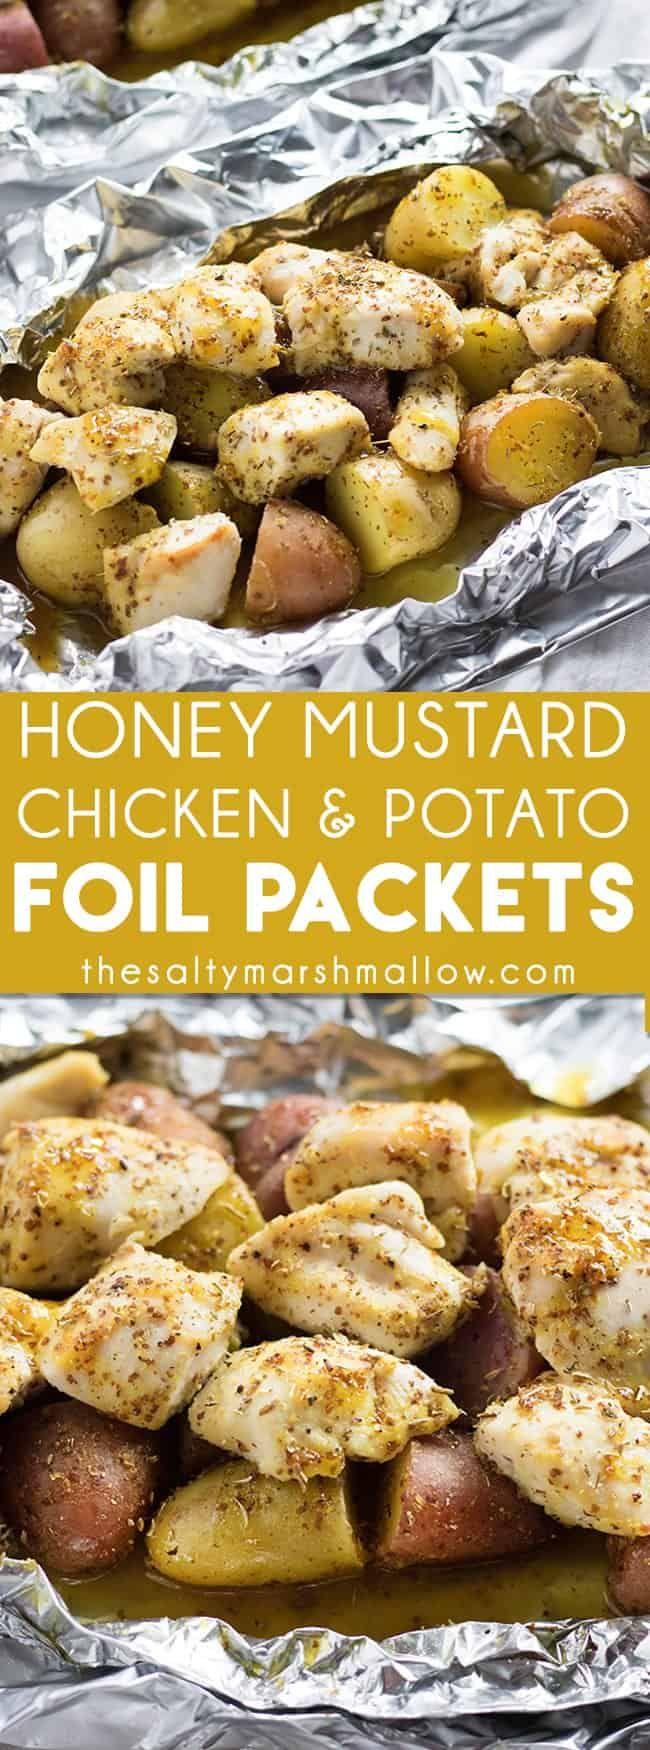 Honey Mustard Chicken Foil Packets - The Salty Marshmallow